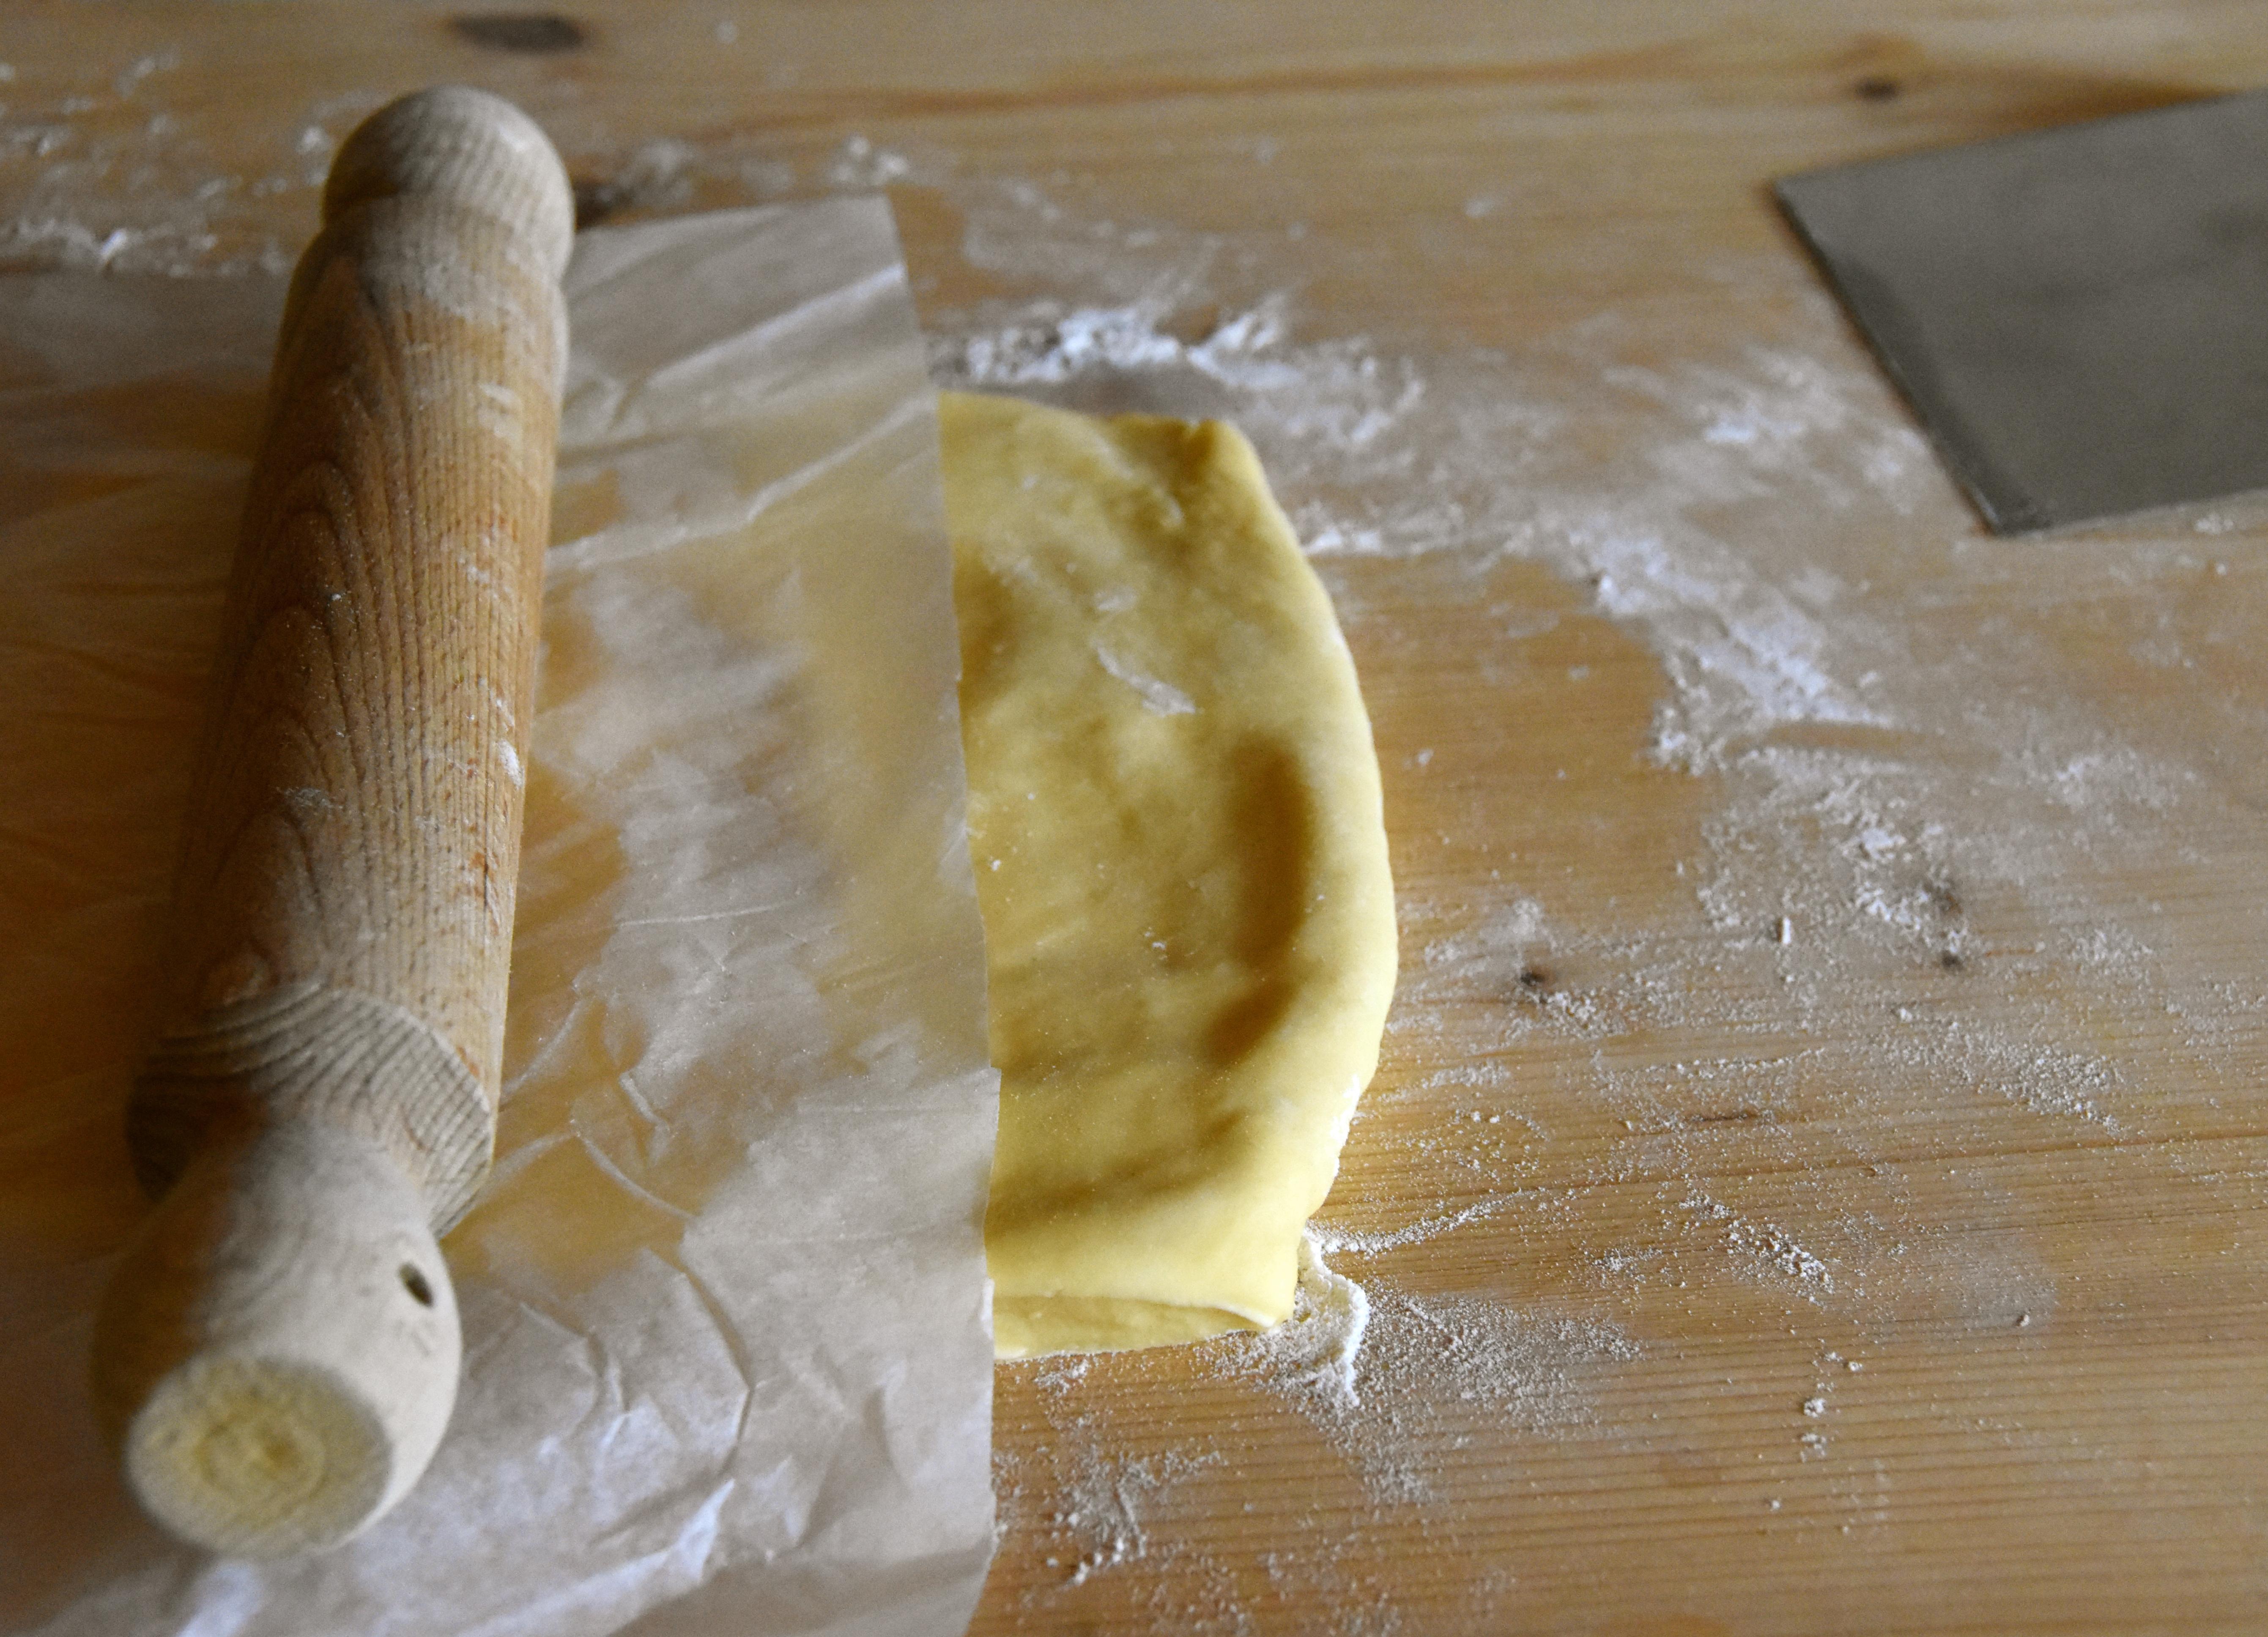 pain au chocolat come farlo a casa